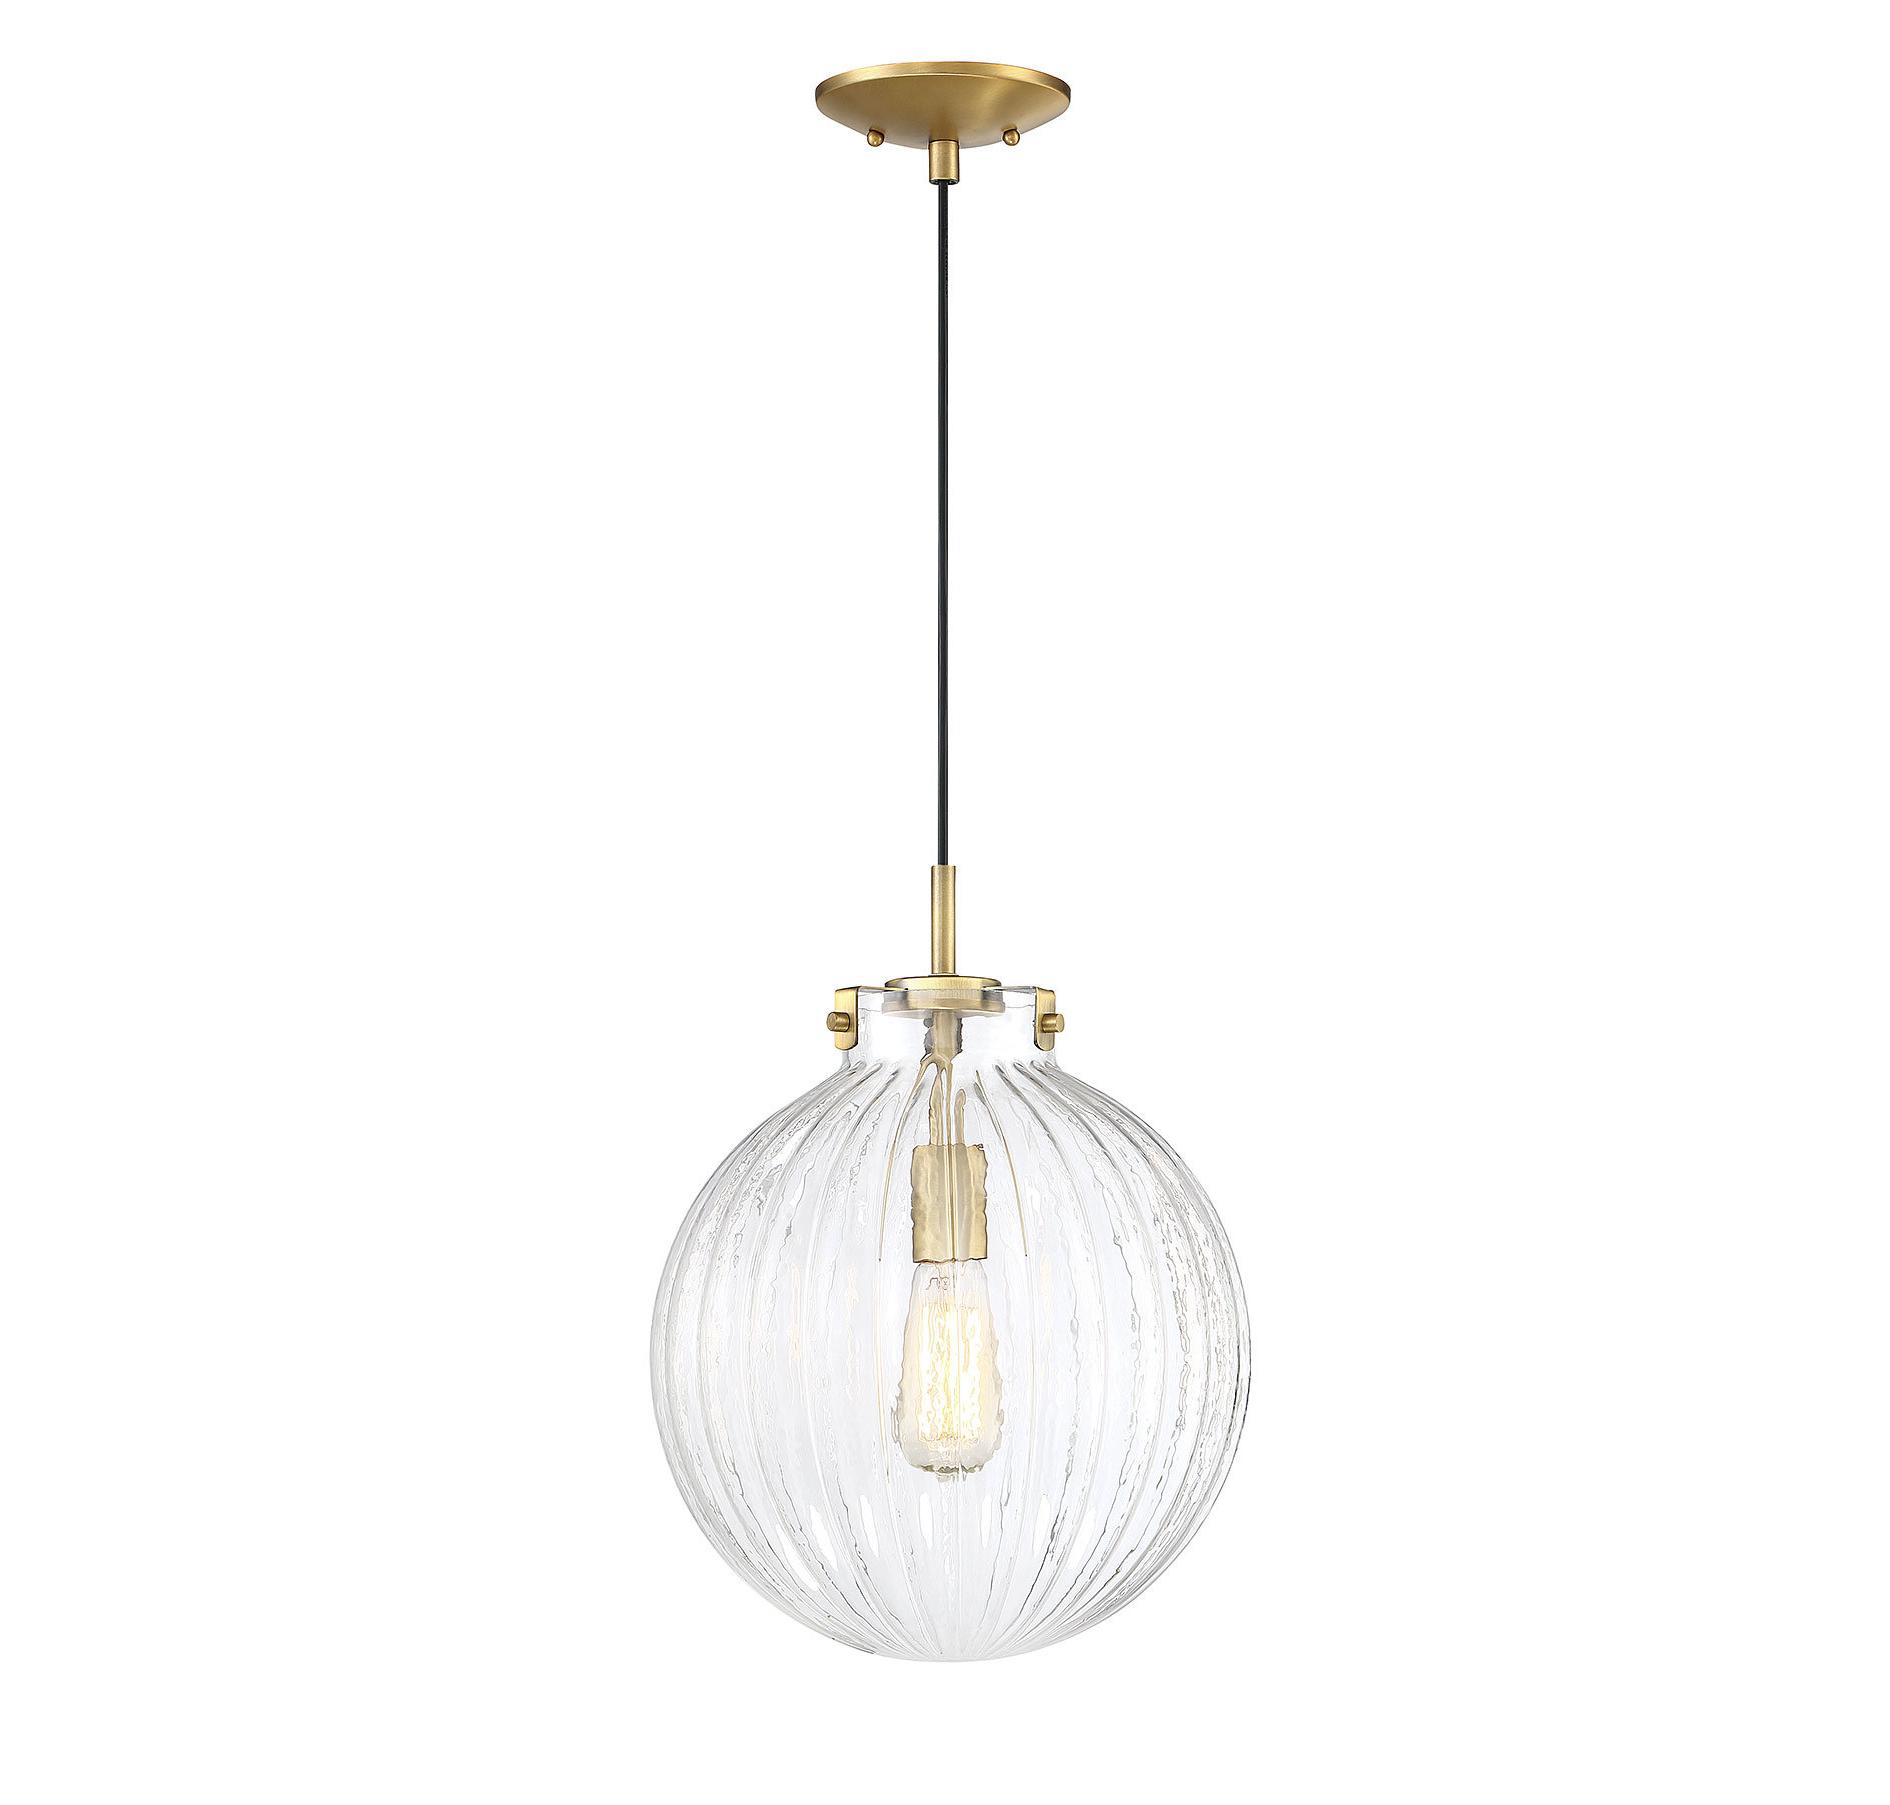 Well Liked Nevels 1 Light Single Globe Pendant Throughout 1 Light Globe Pendants (View 10 of 20)